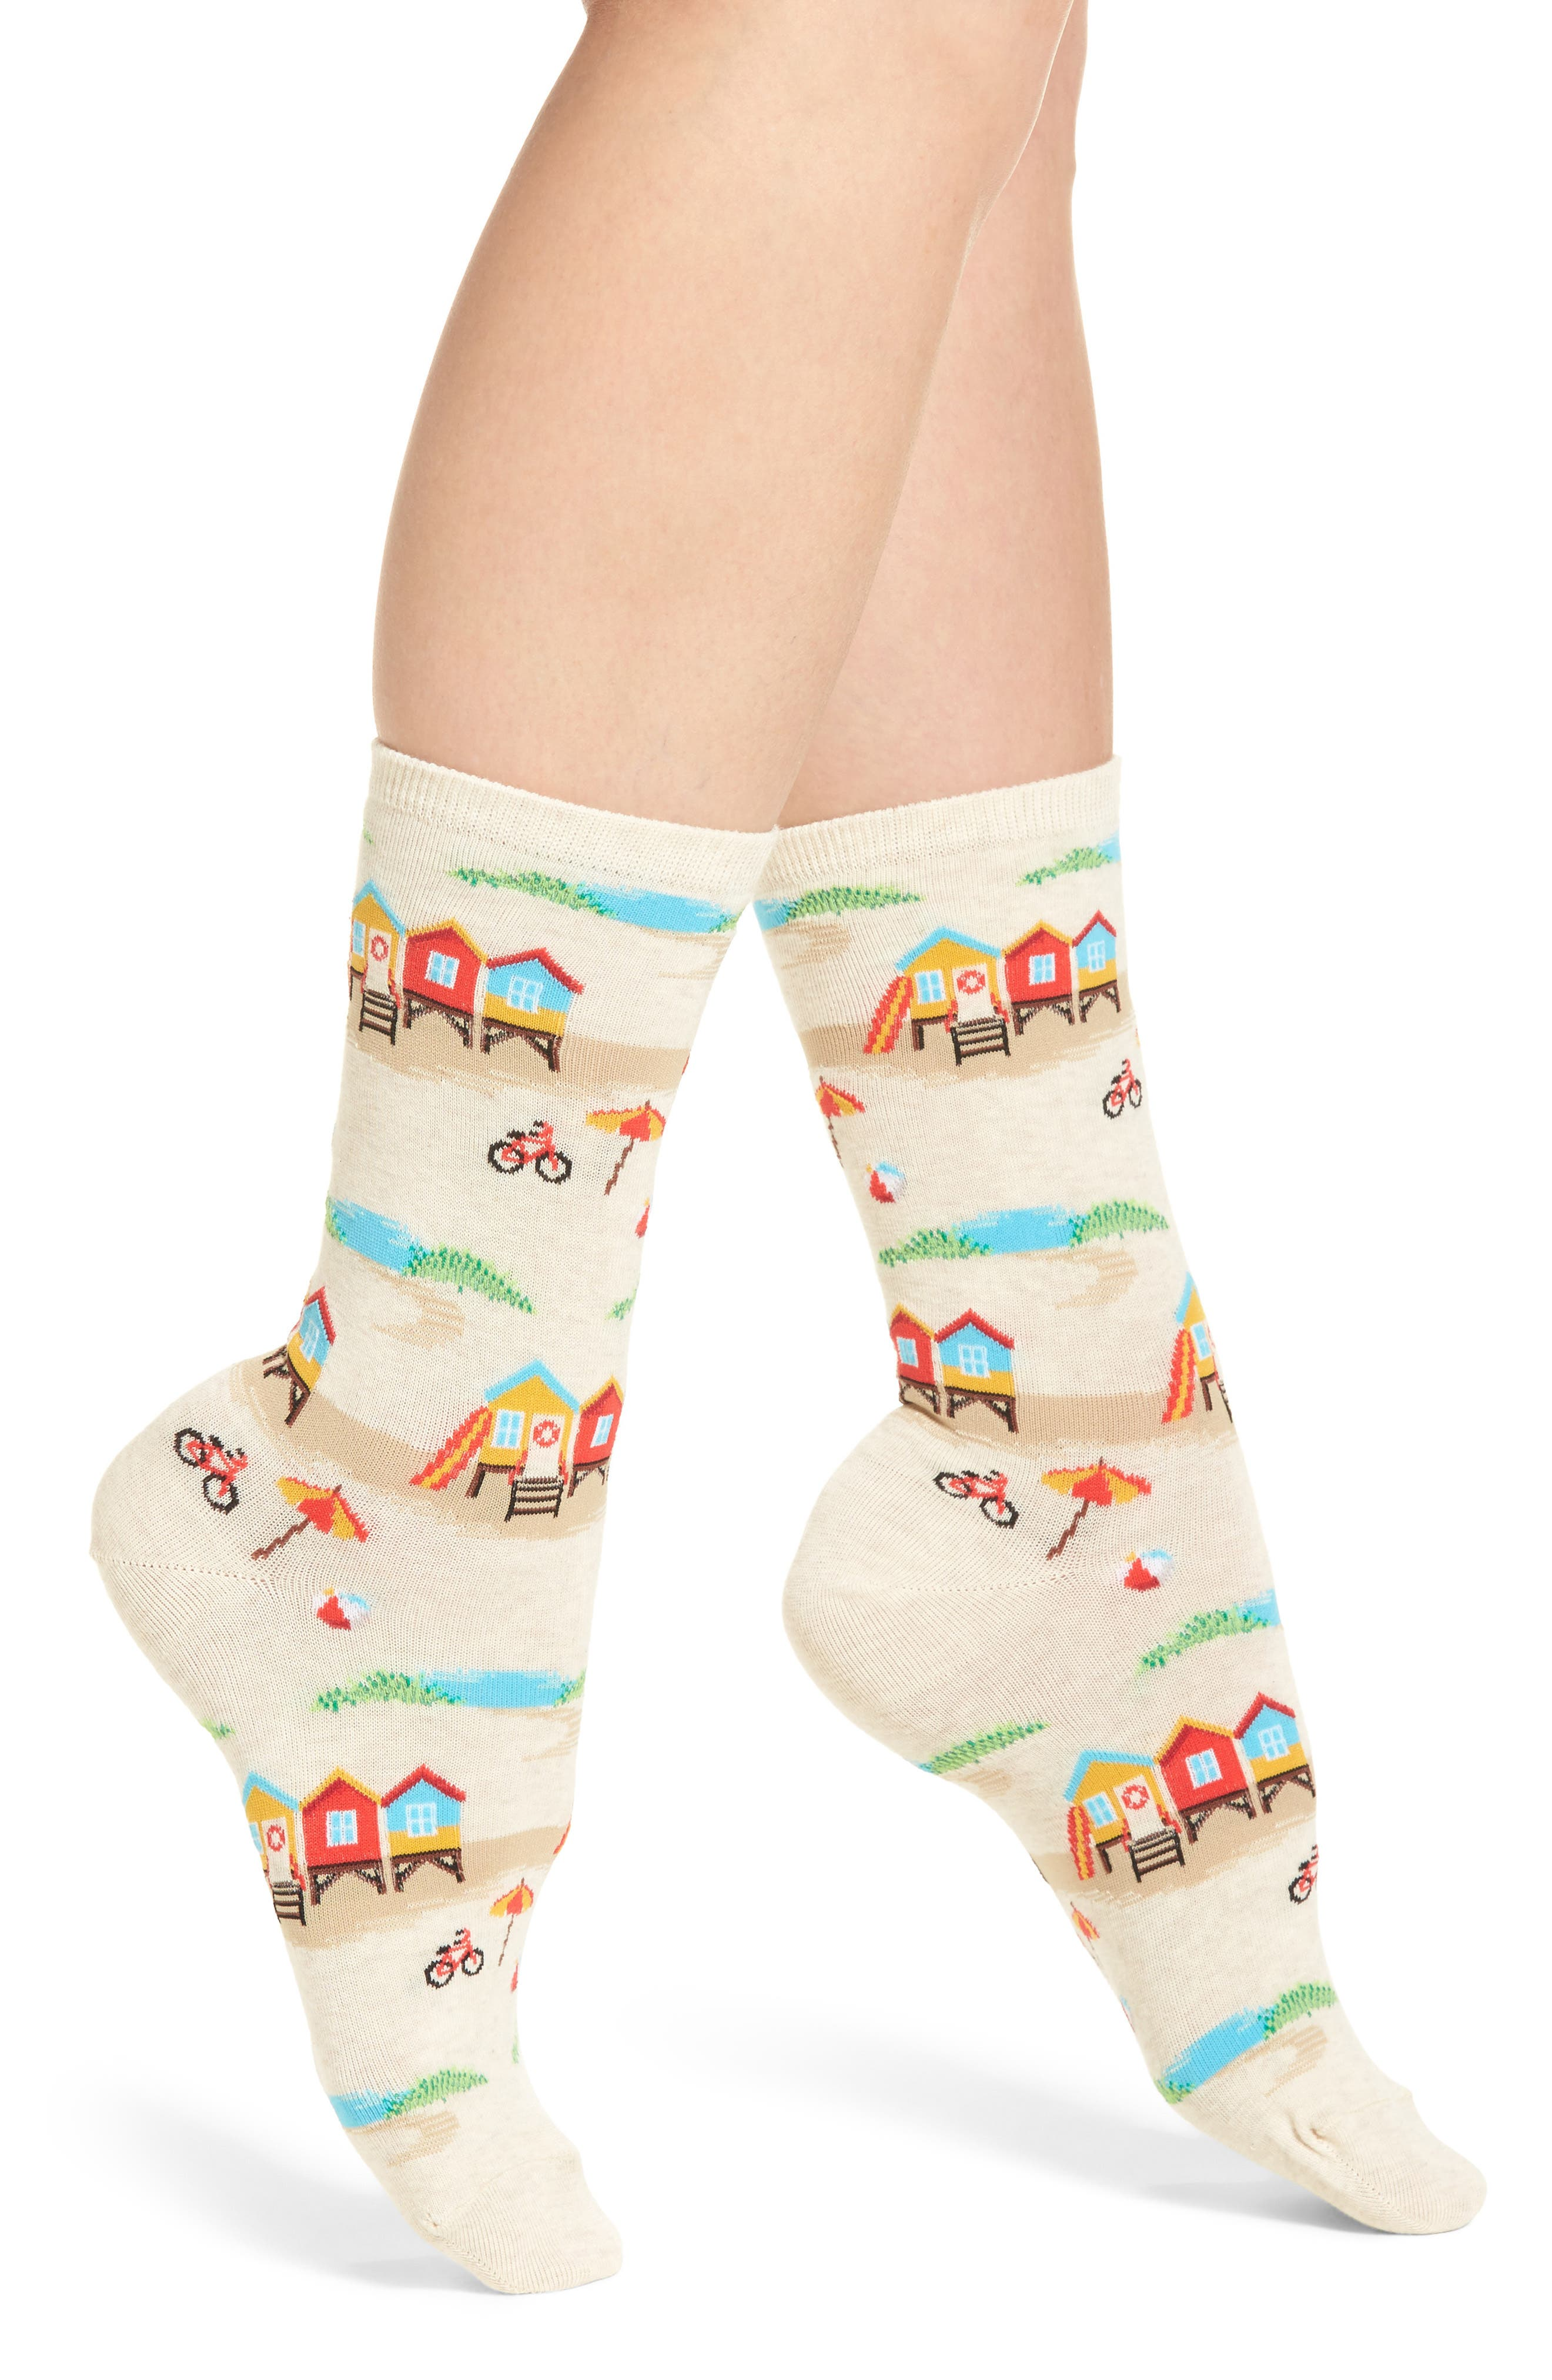 Hot Sox Cabana Scene Crew Socks (3 for $15)